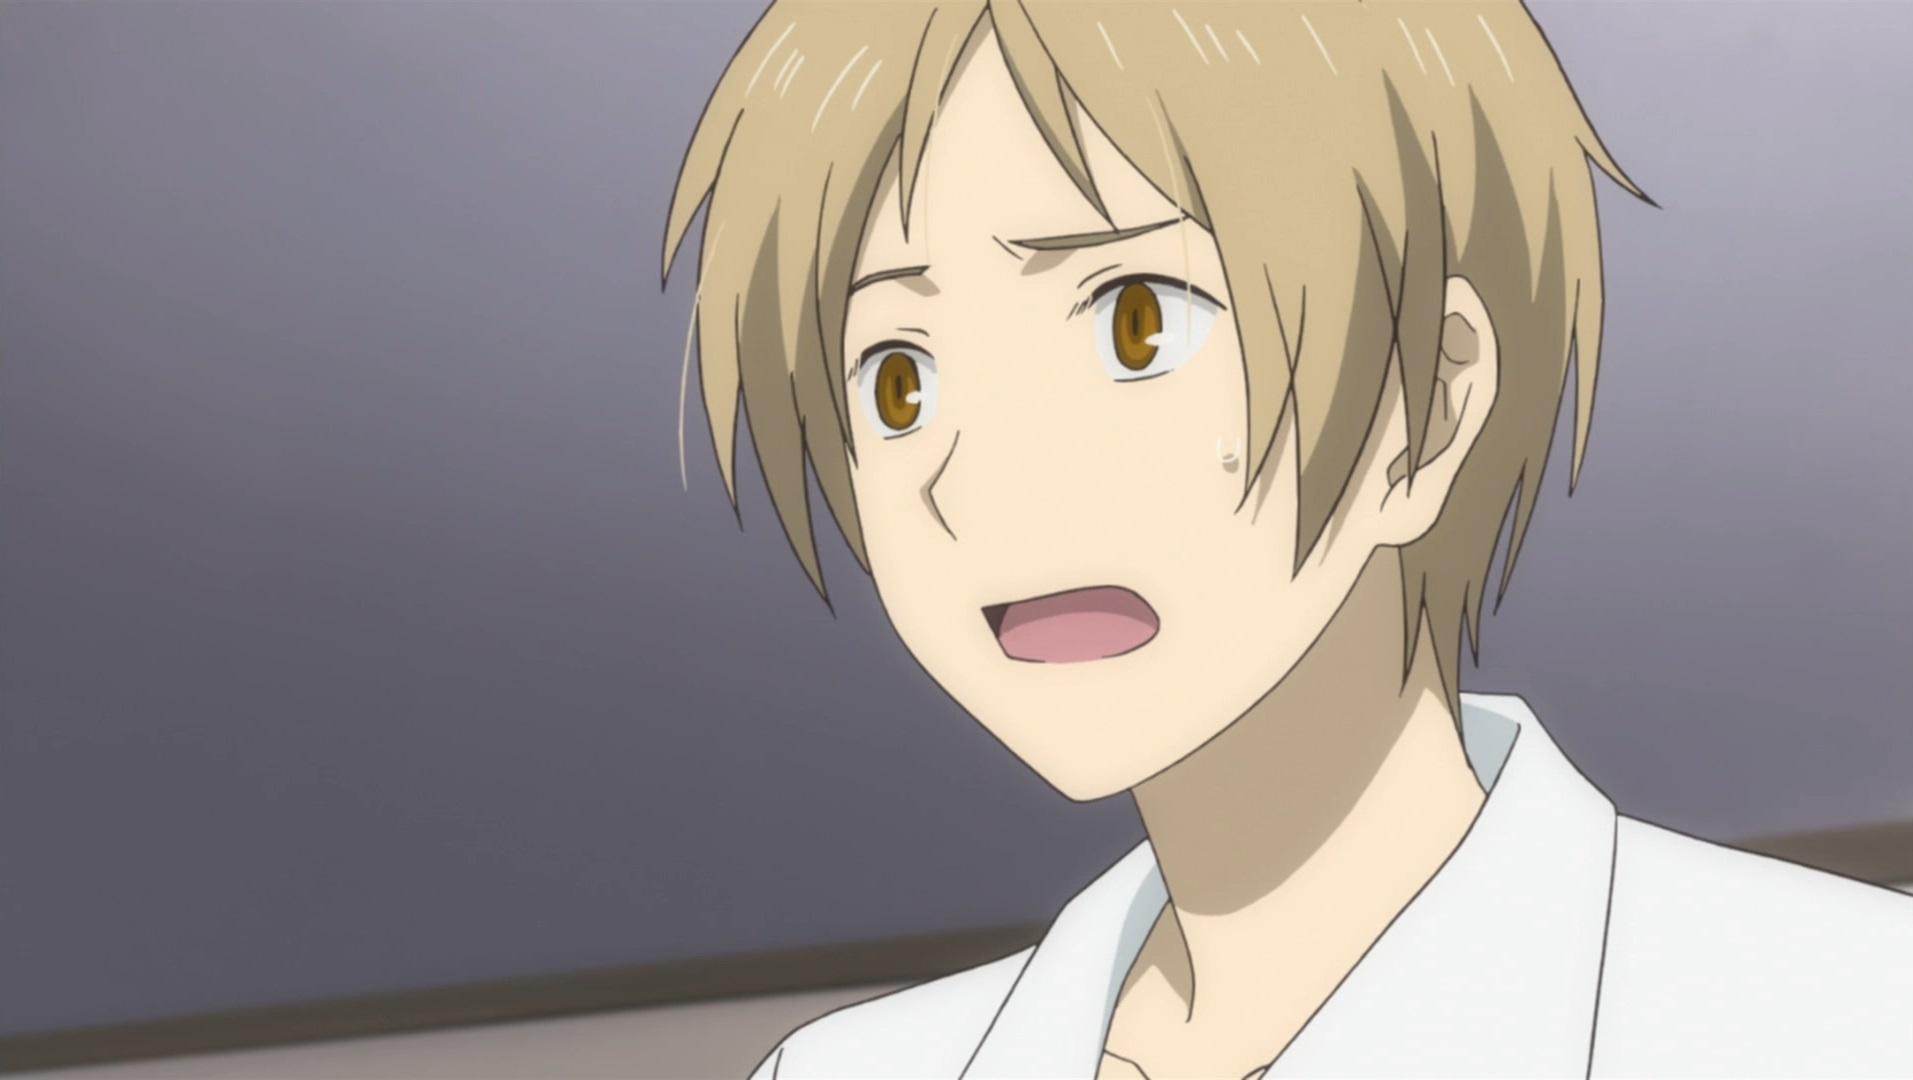 File:Natsume-huh.jpg